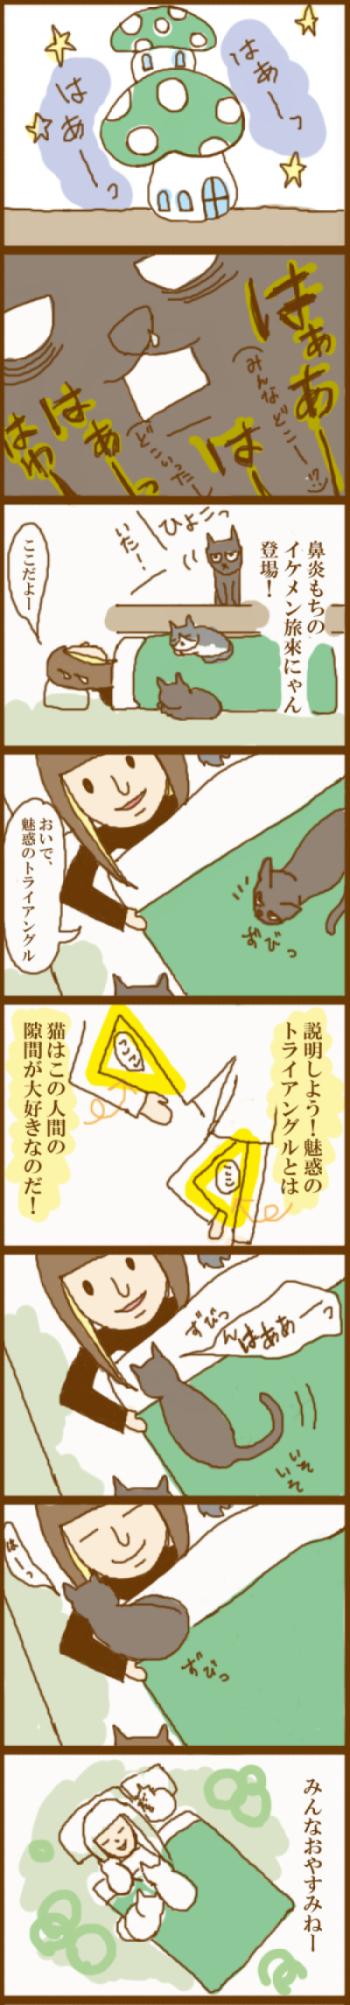 f:id:suzuokayu:20201011193509j:plain